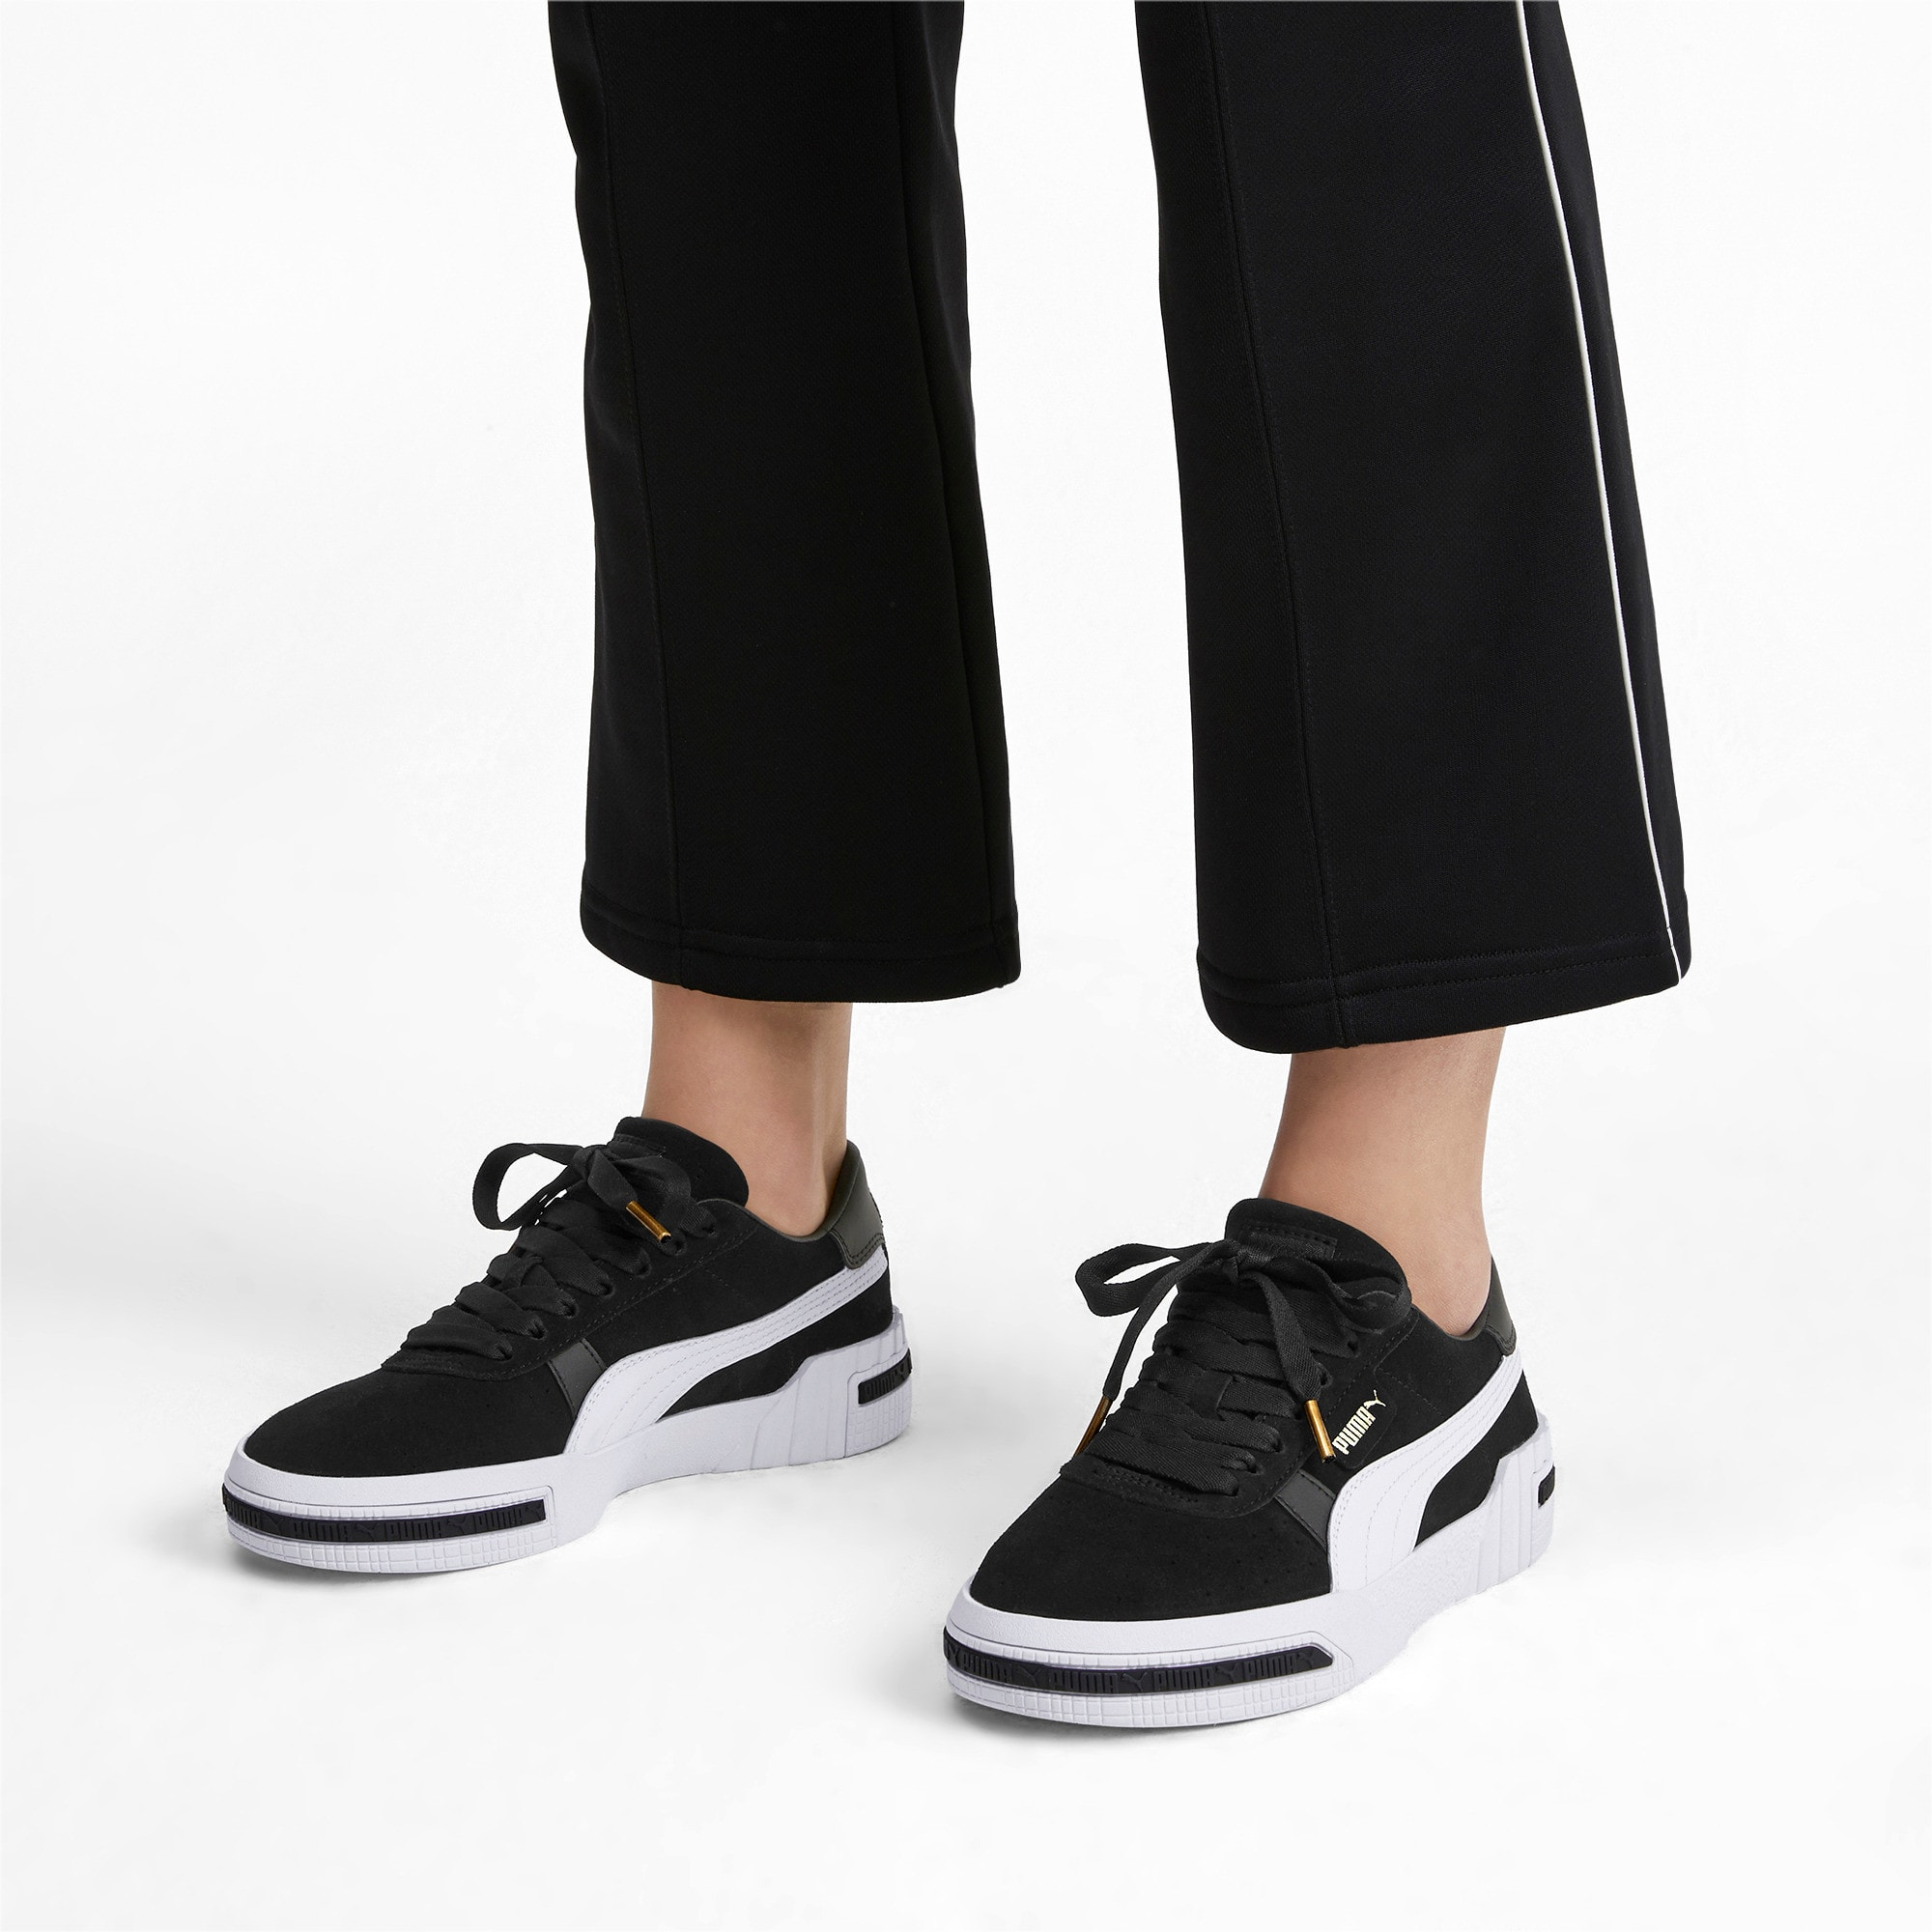 Thumbnail 2 of Cali Taped Damen Sneaker, Puma Black-Metallic Gold, medium